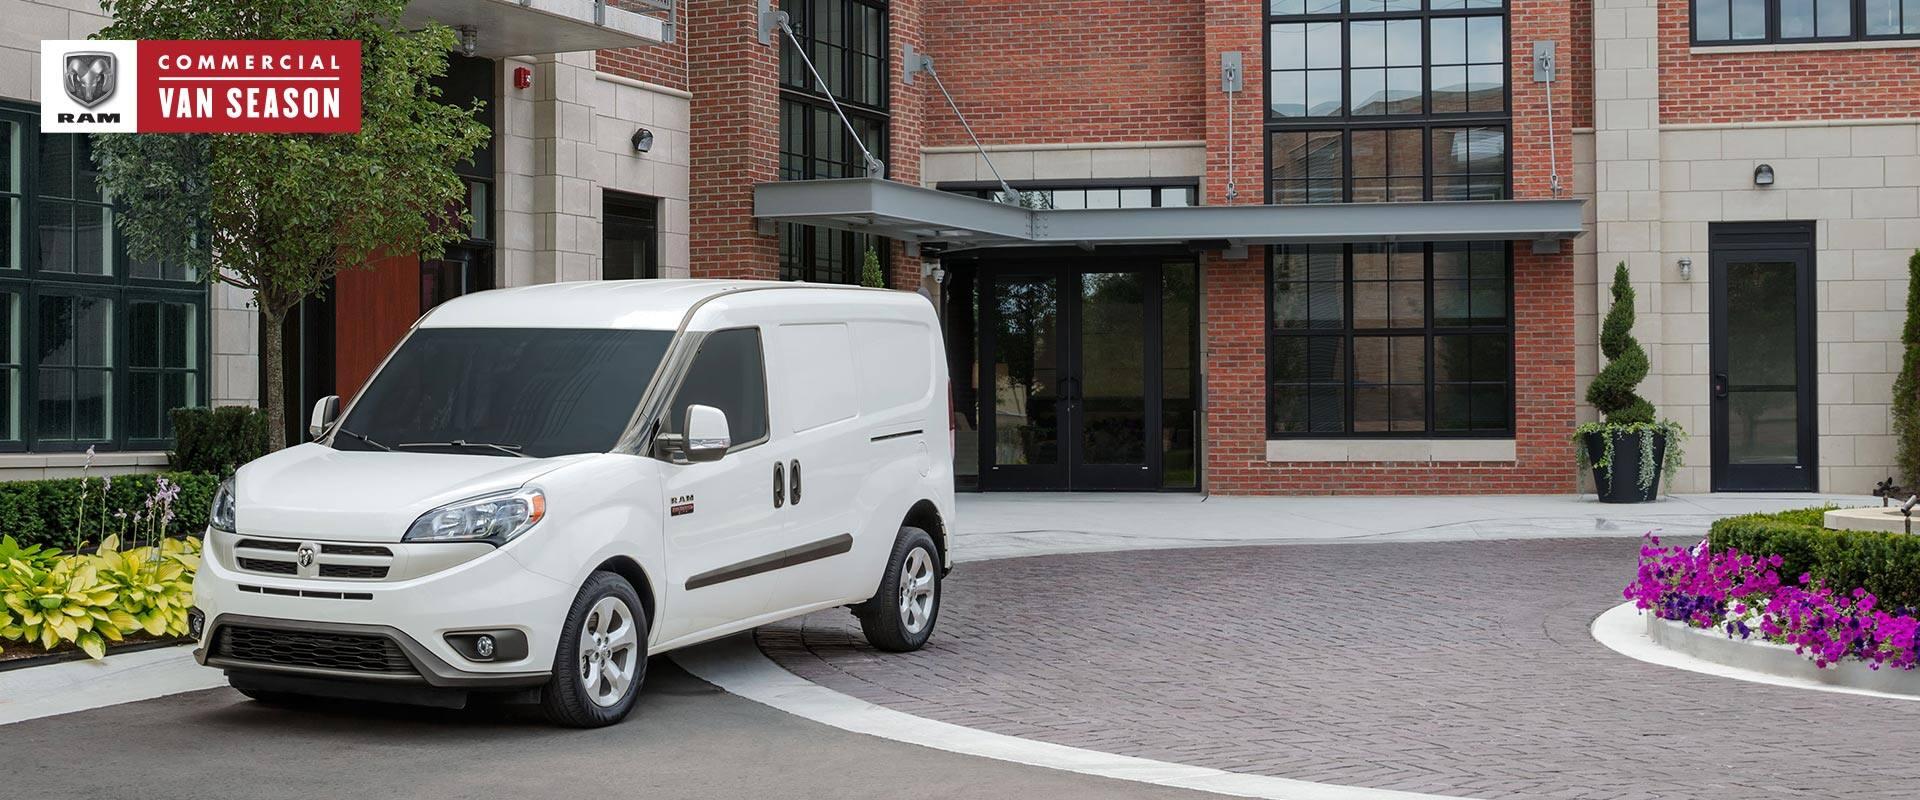 2018 Ram Trucks ProMaster City - Efficient Cargo Van